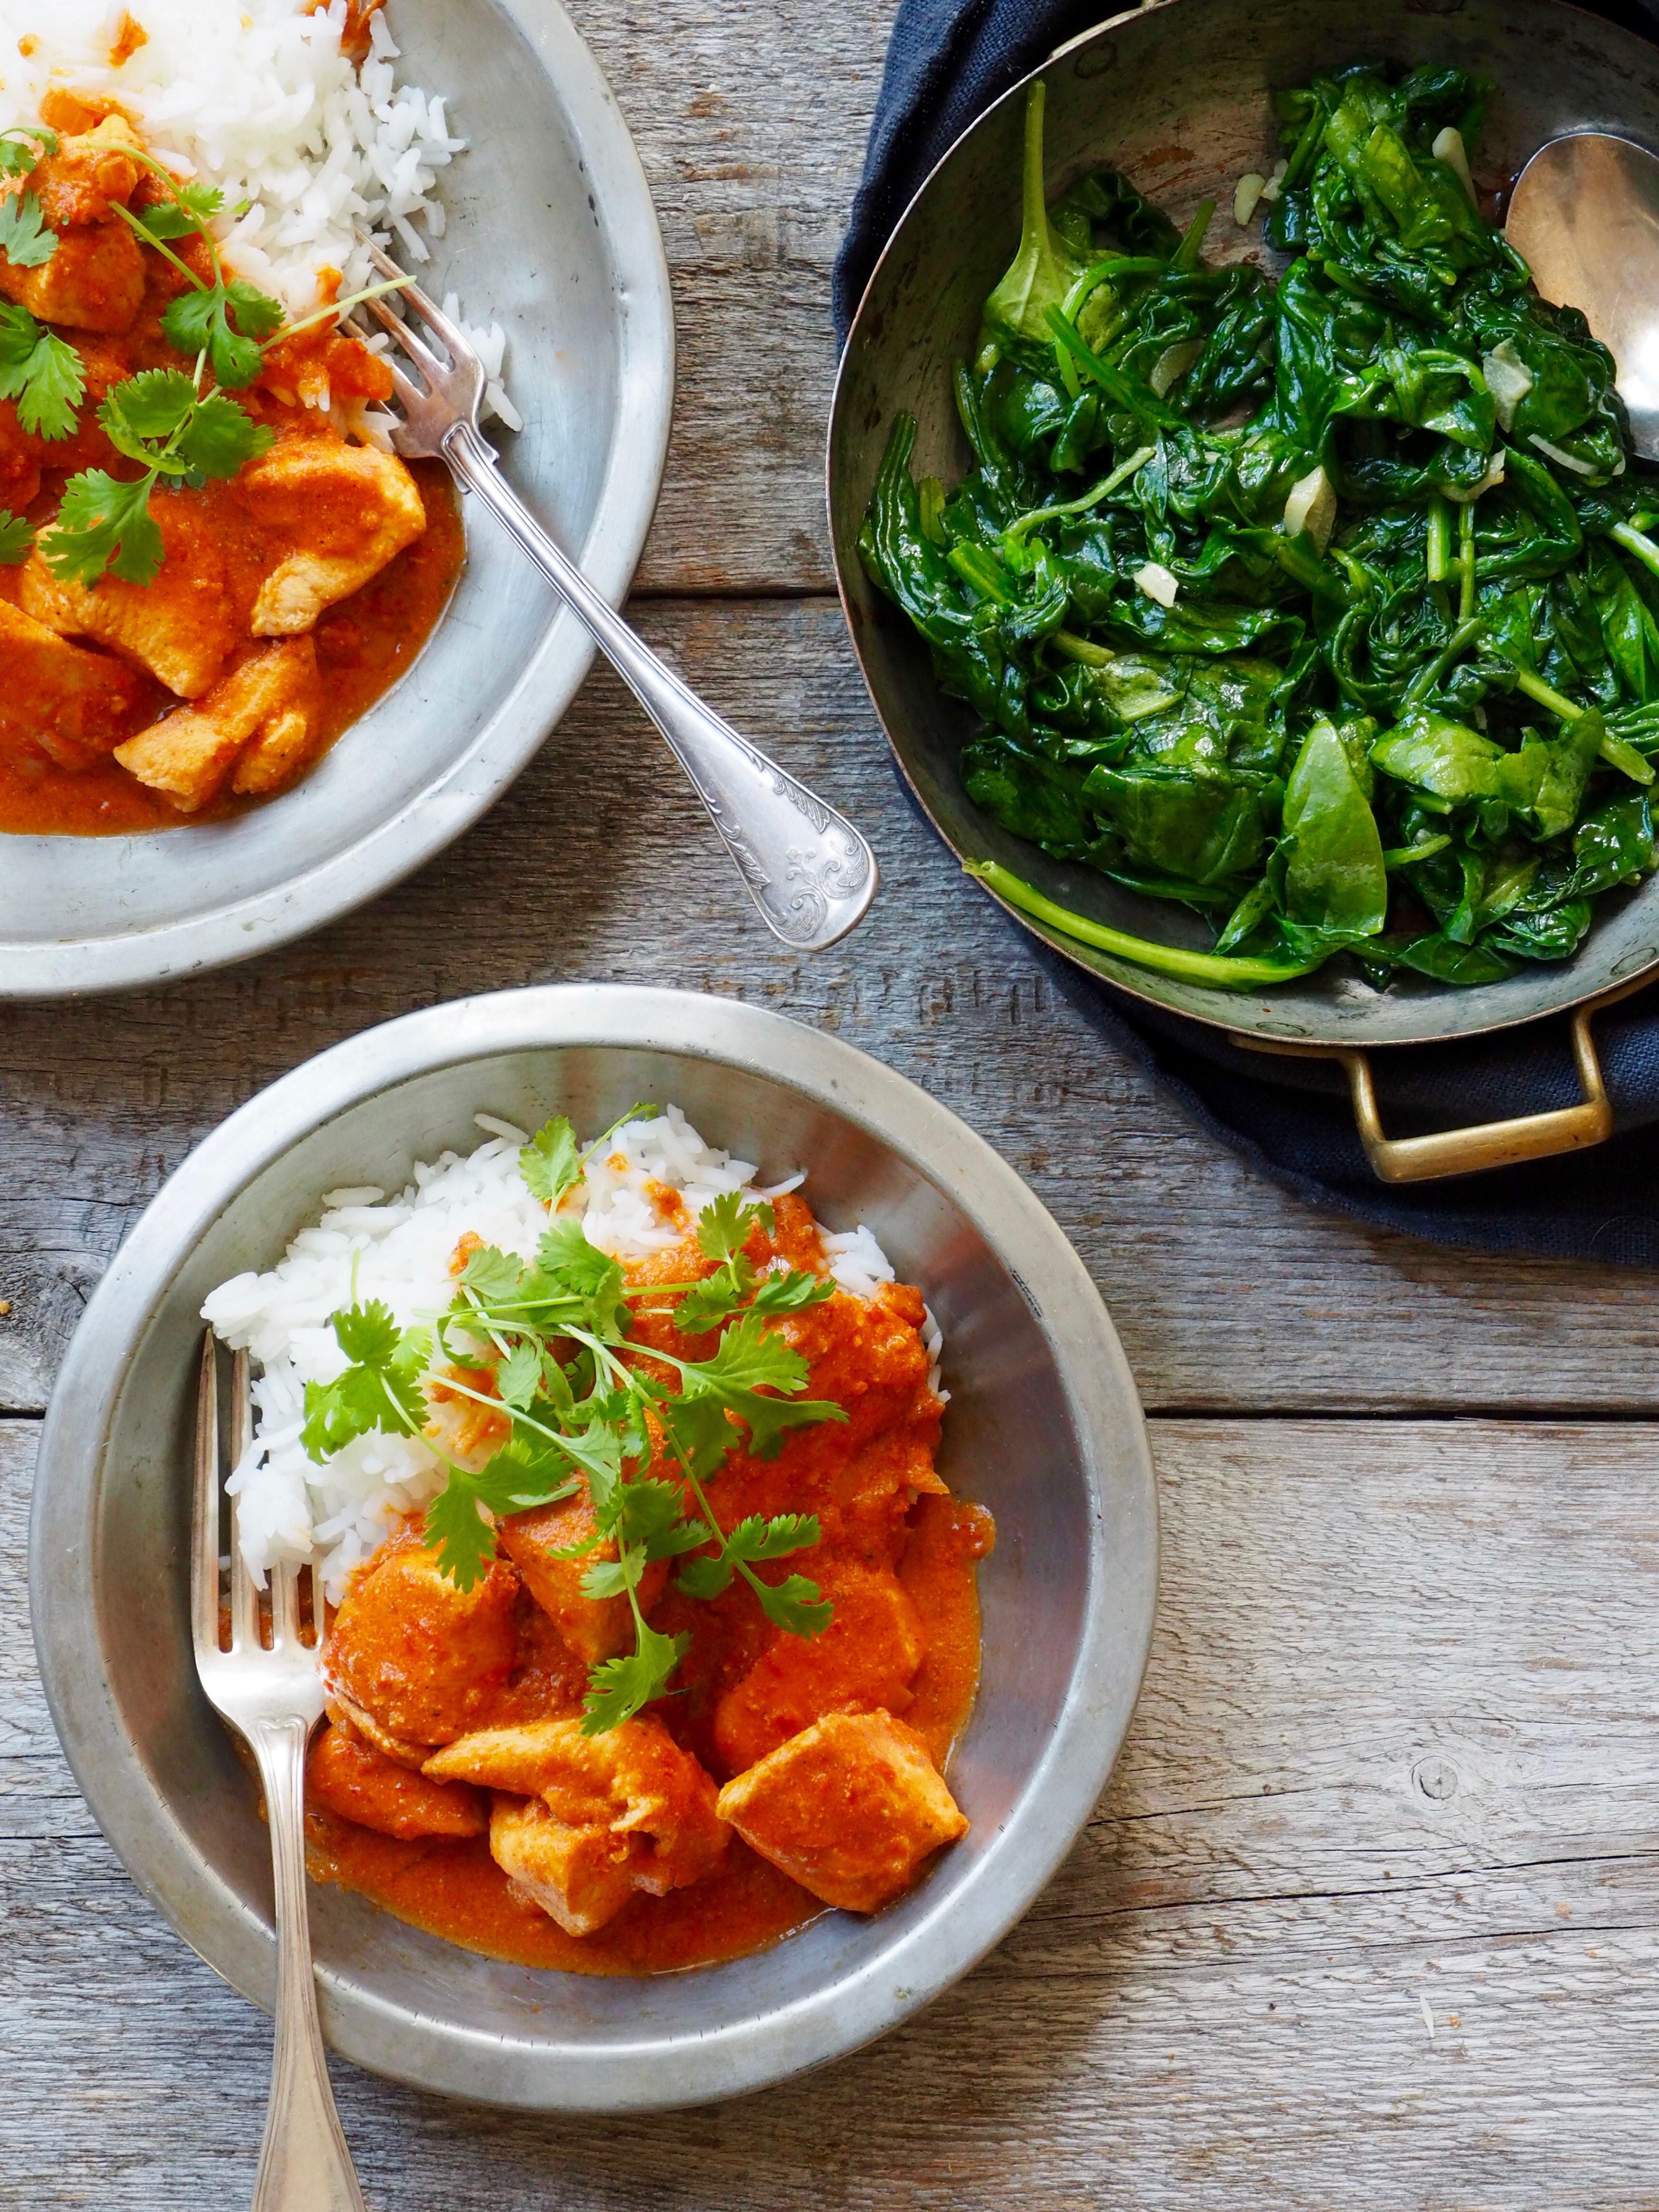 indisk mat oppskrifter kylling